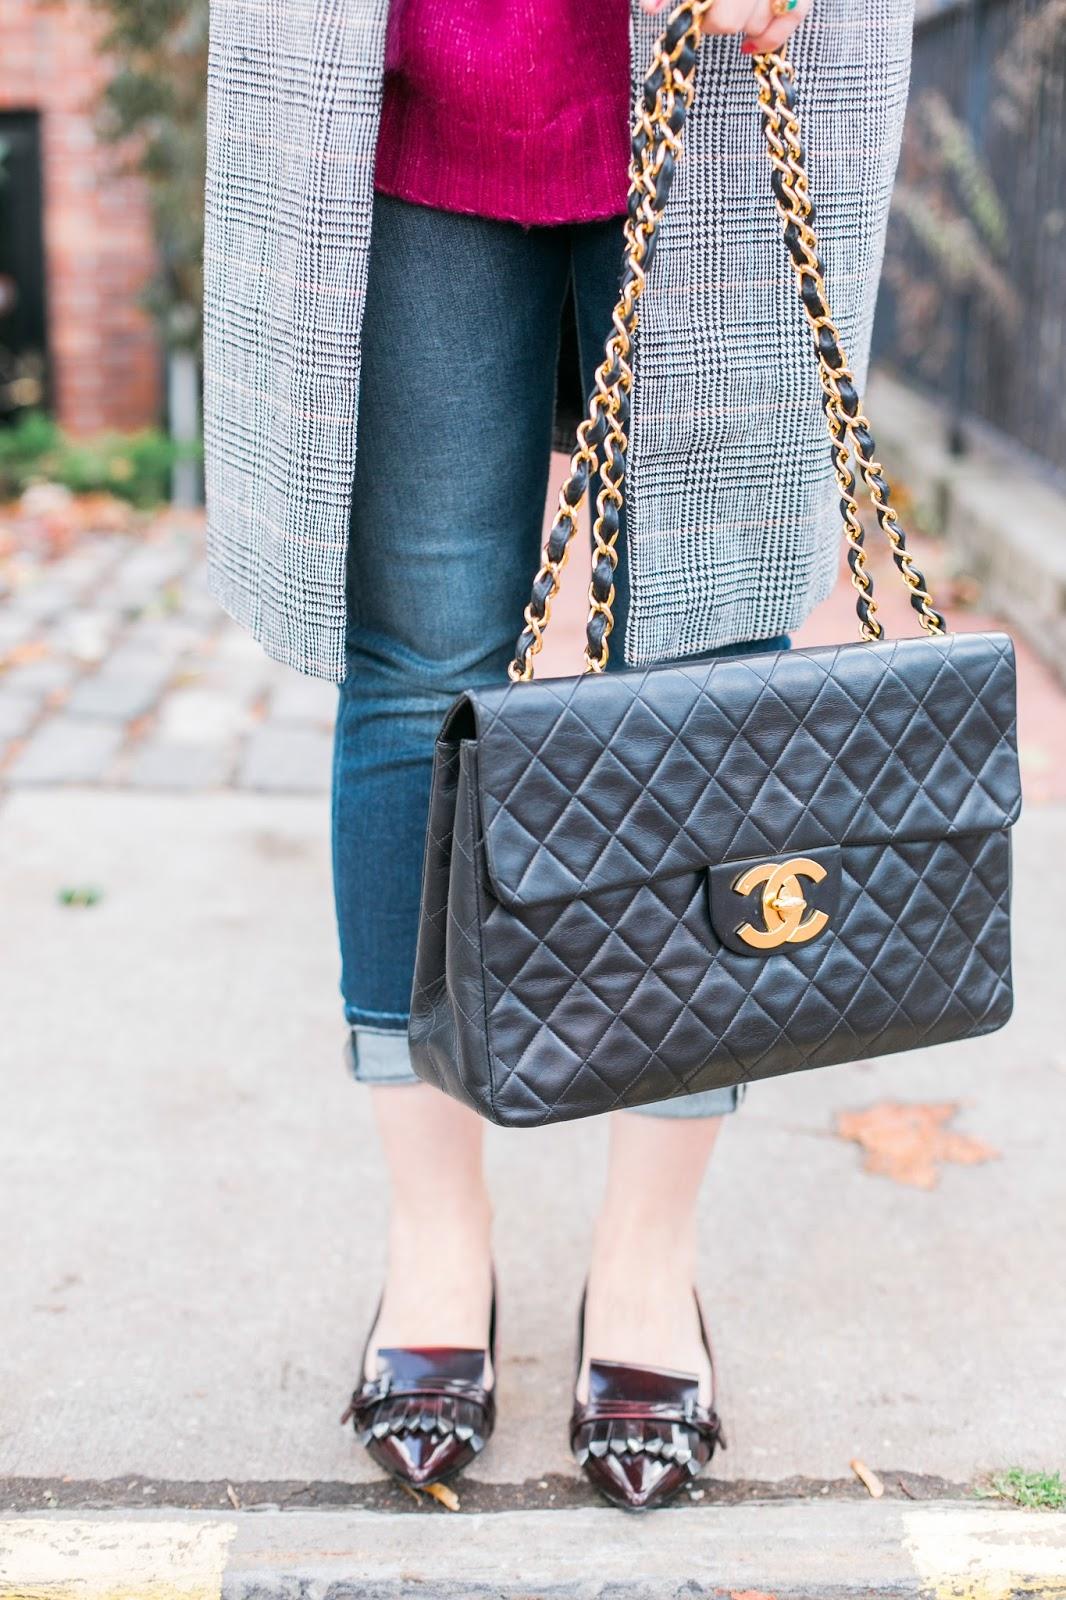 Bijuleni - Vintage Chanel handbag